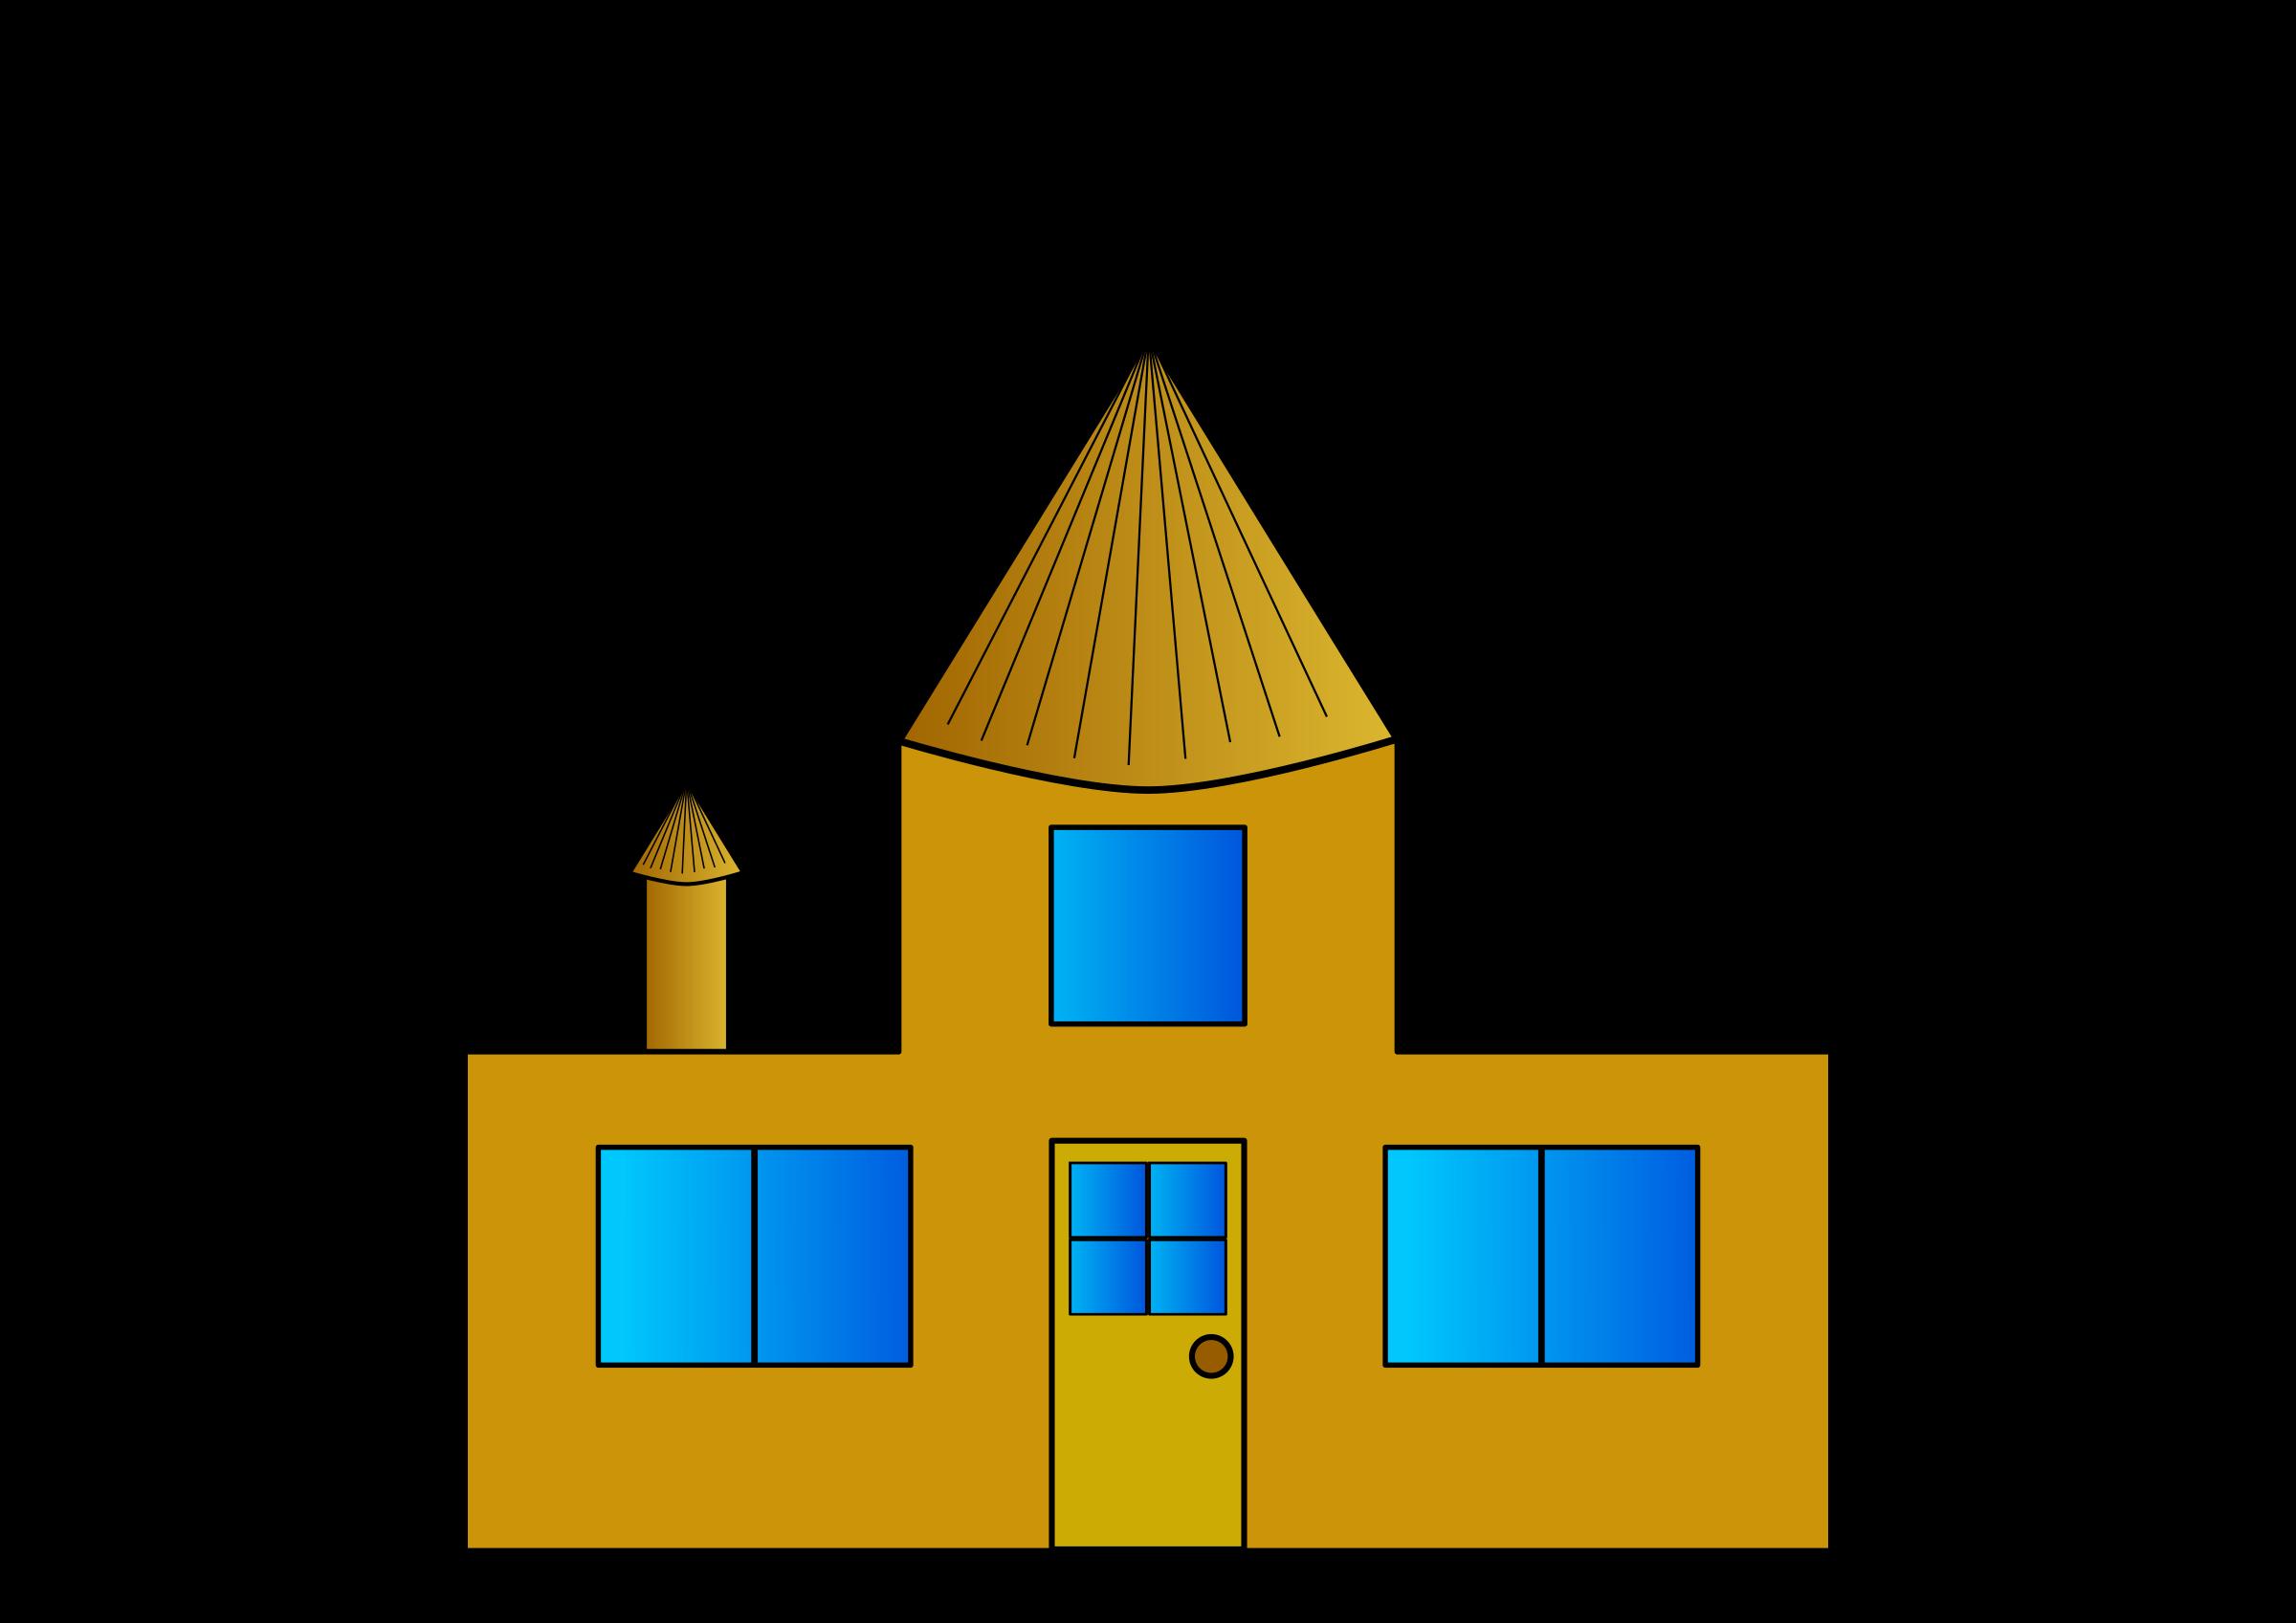 House clipart diagram. Golden big image png